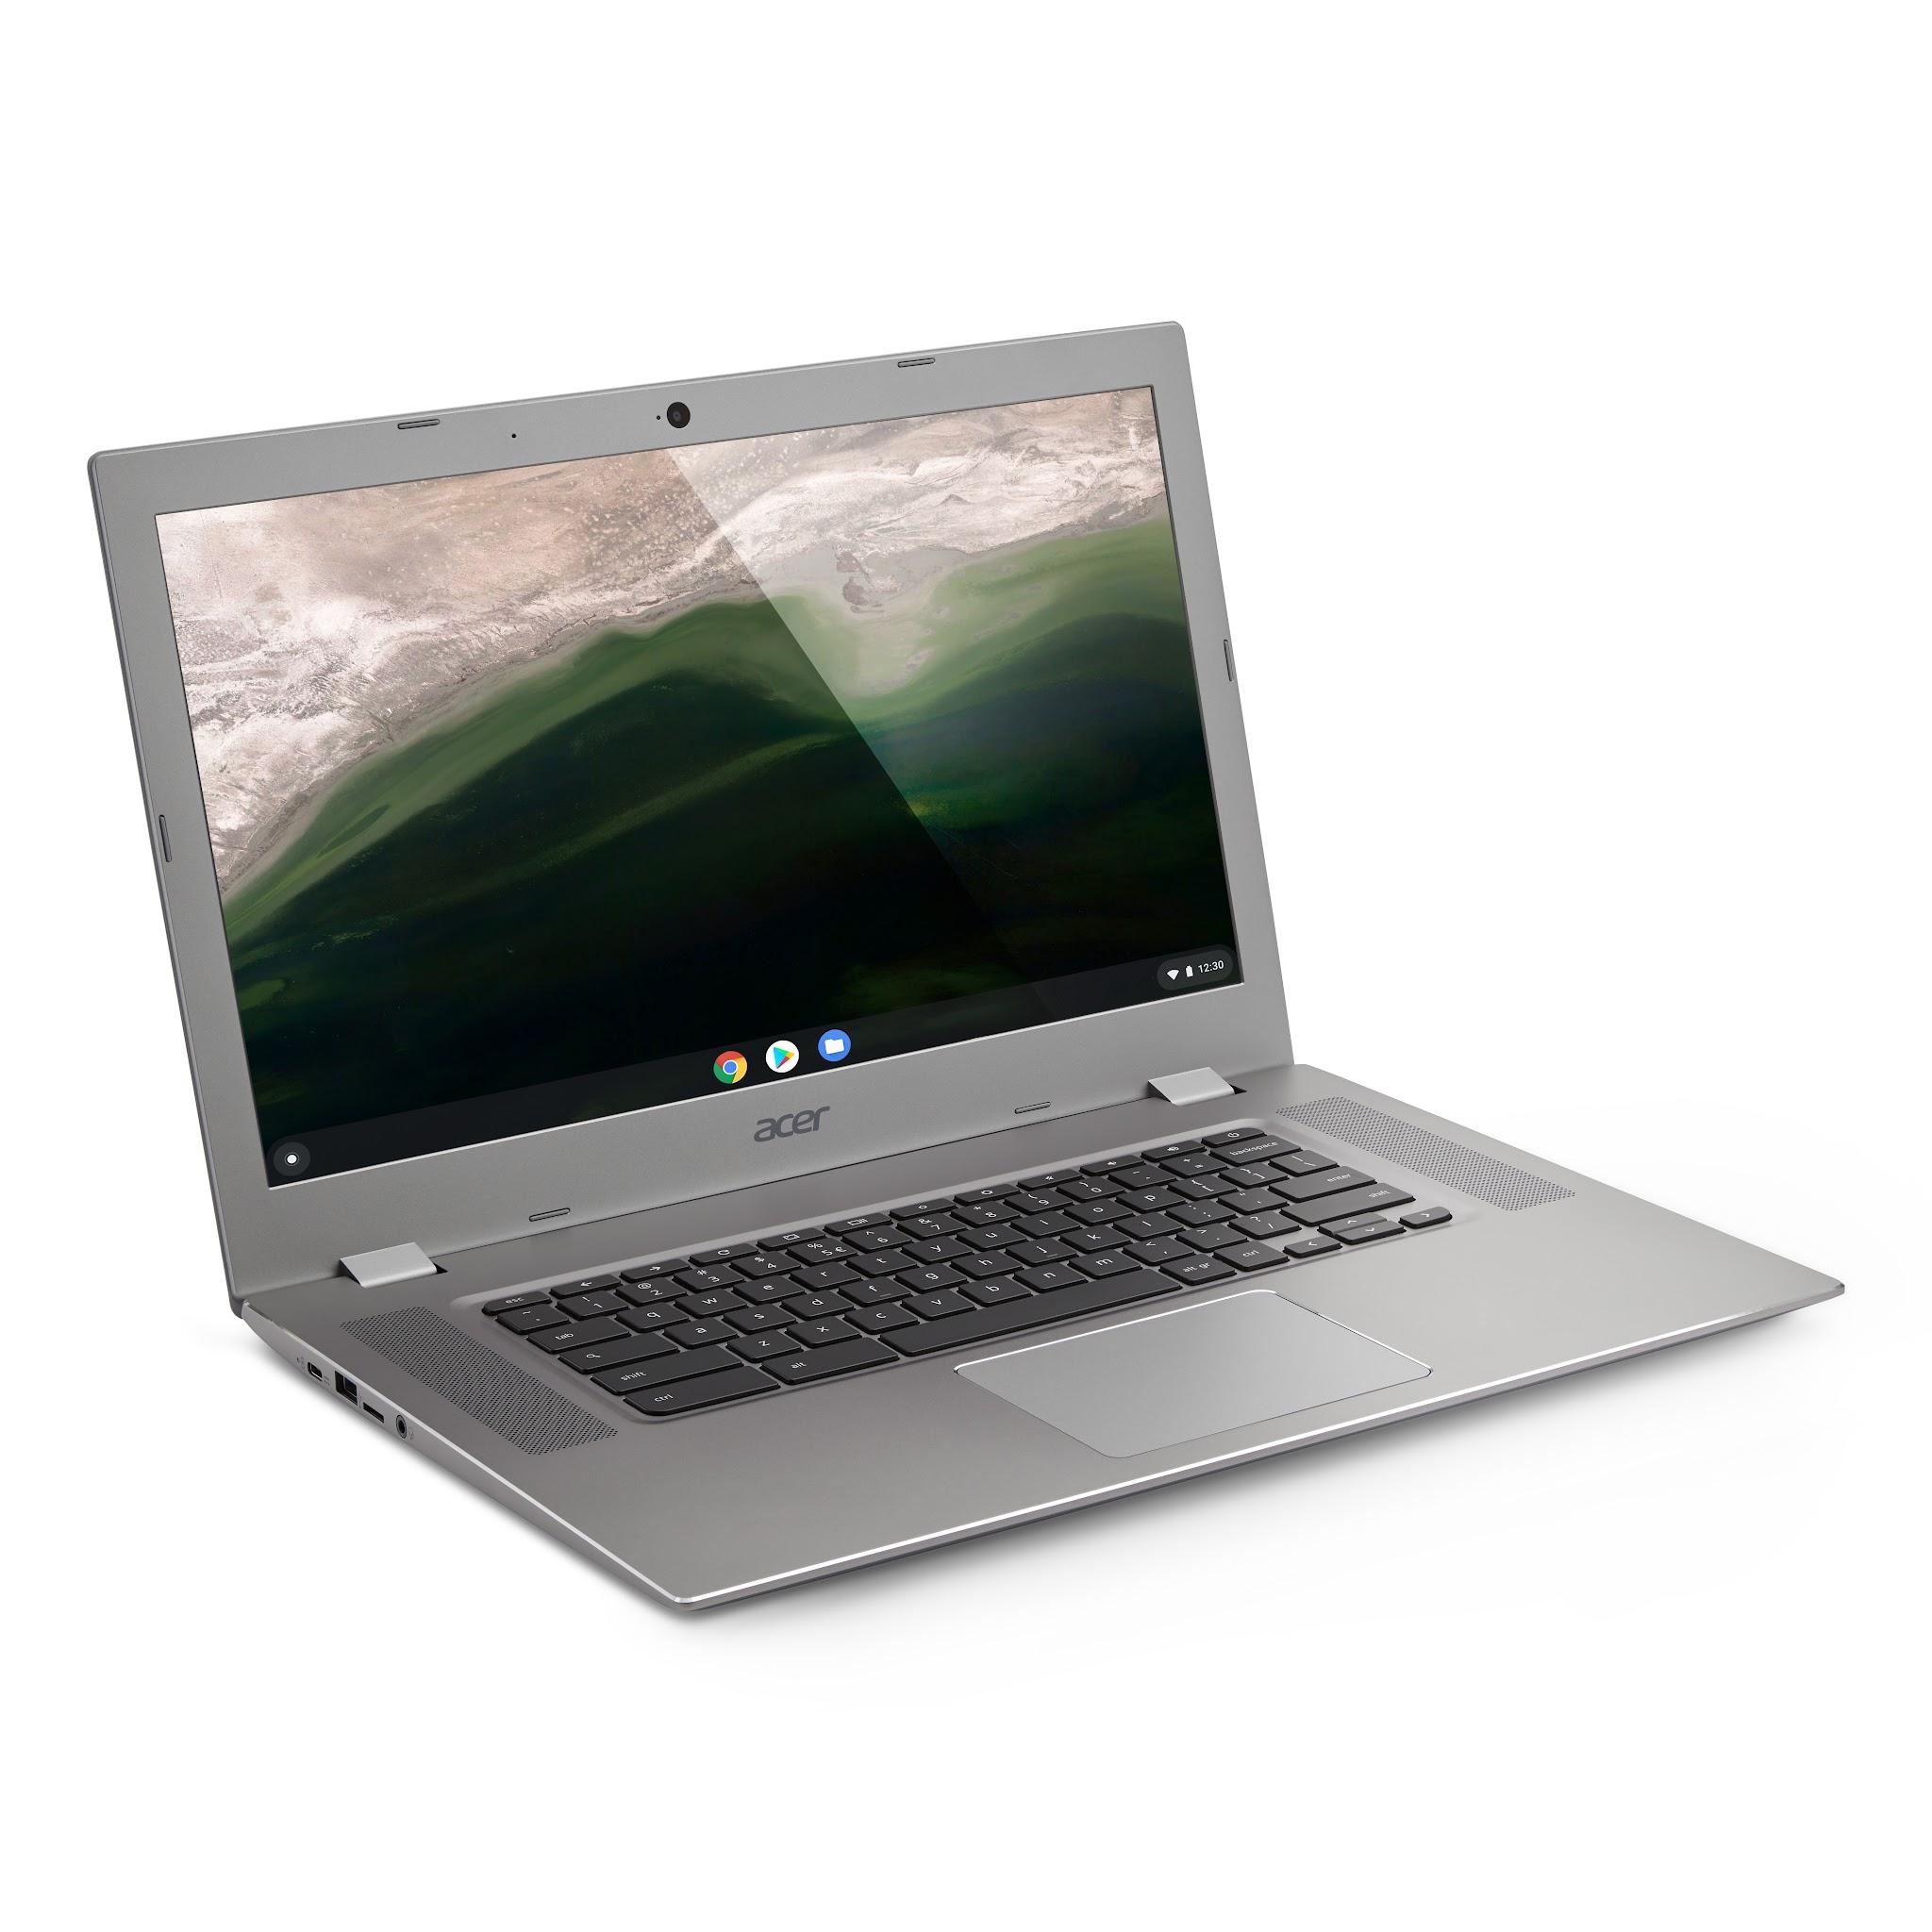 Acer Chromebook 15 (CB315-1HT) - photo 3